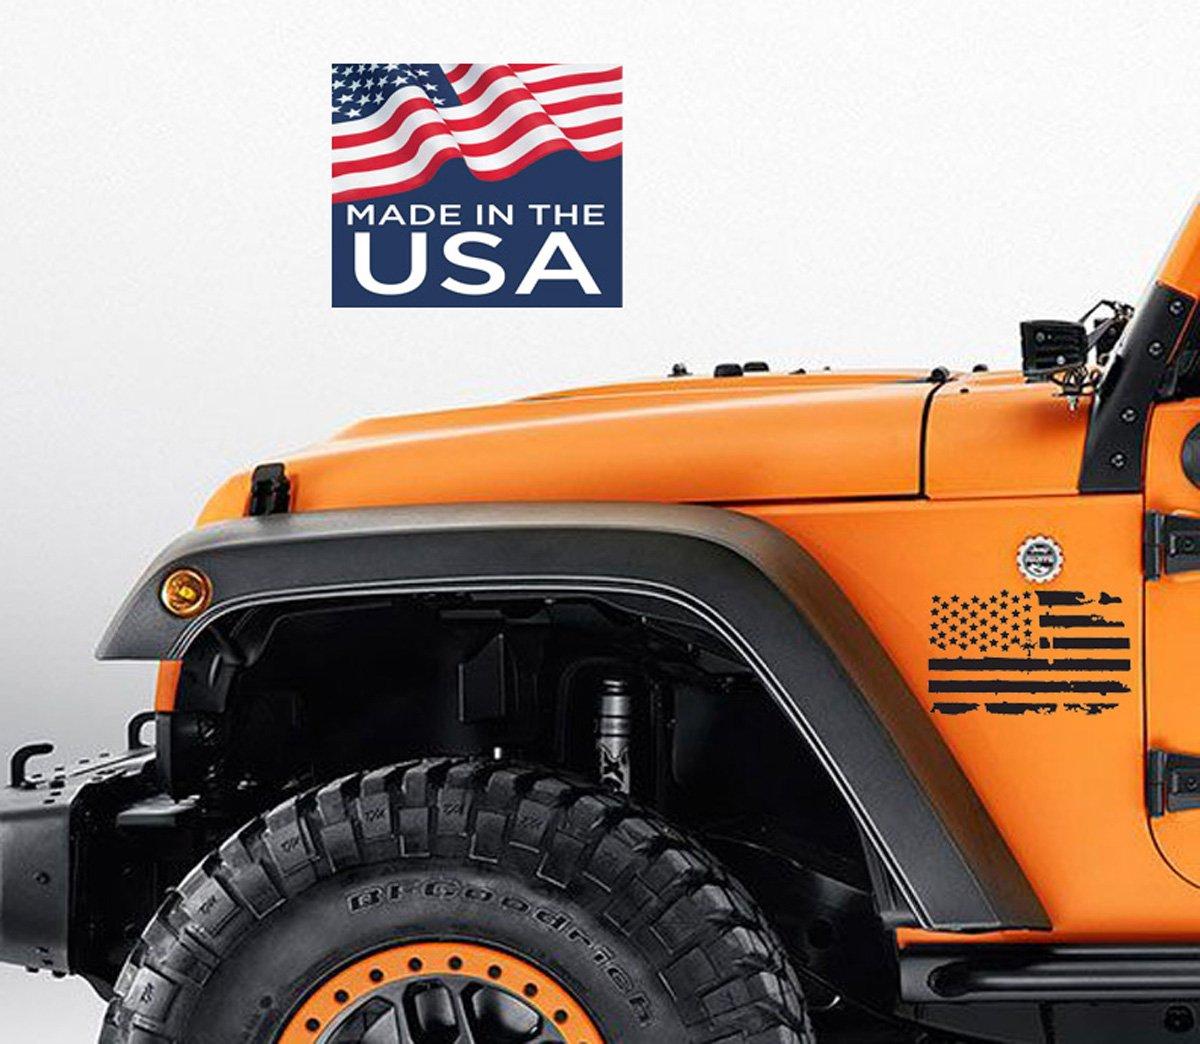 Jeep Wrangler Renegade >> 2 Us Flag Vinyl Side Decals Fit All Trucks Cars Jeep Wrangler Renegade American Usa